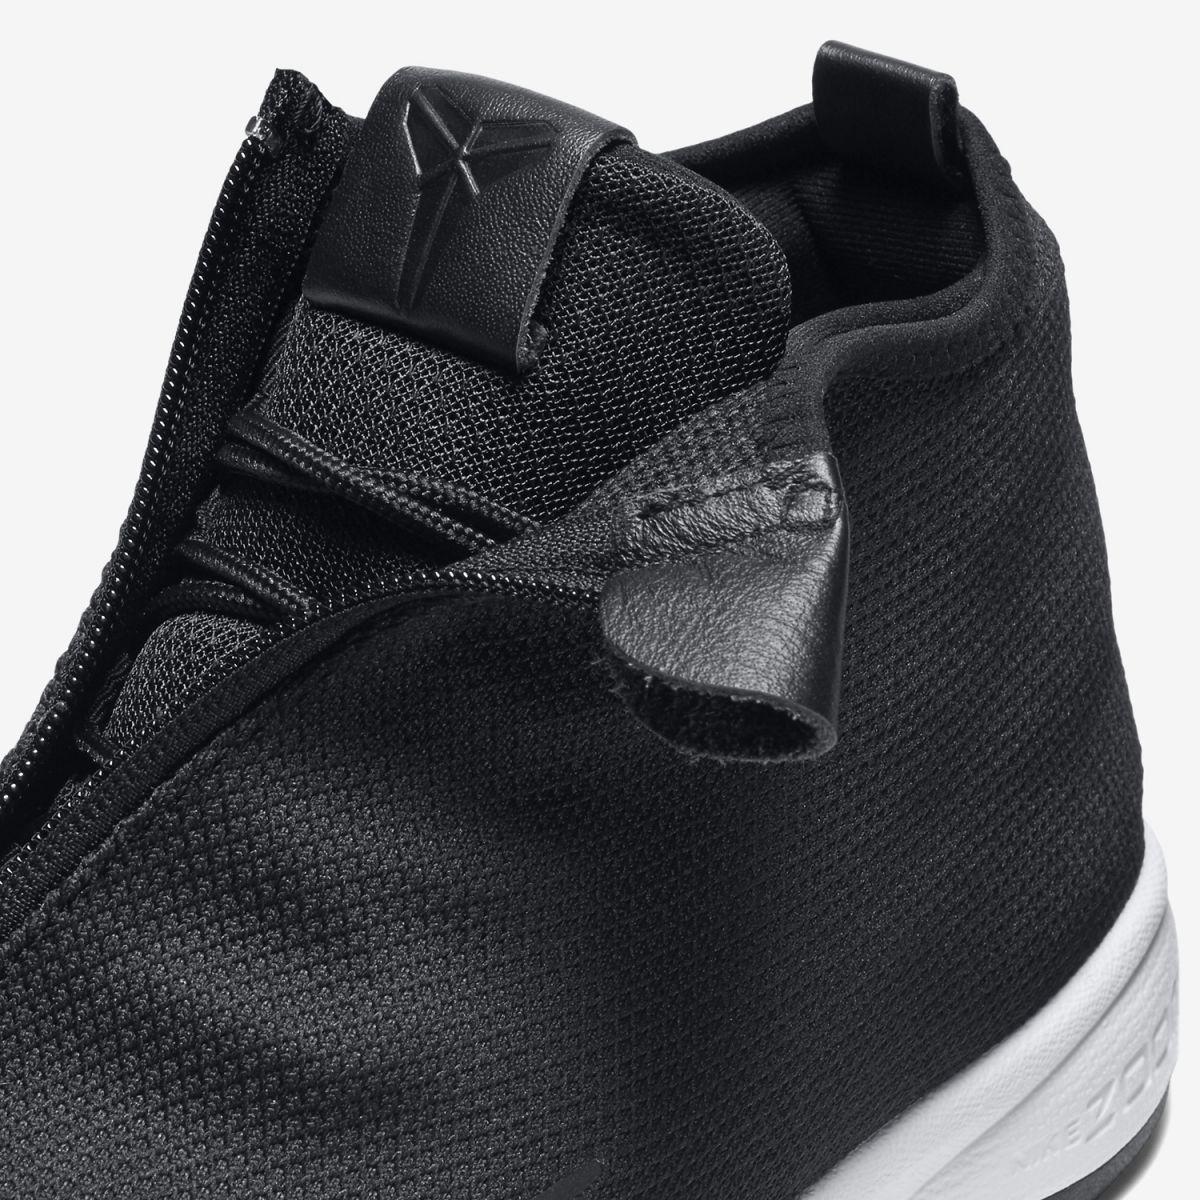 4d9e3108a160 Nike Zoom Kobe Icon  New Kobe Sneaker or Glove Redo  - Air 23 - Air Jordan  Release Dates